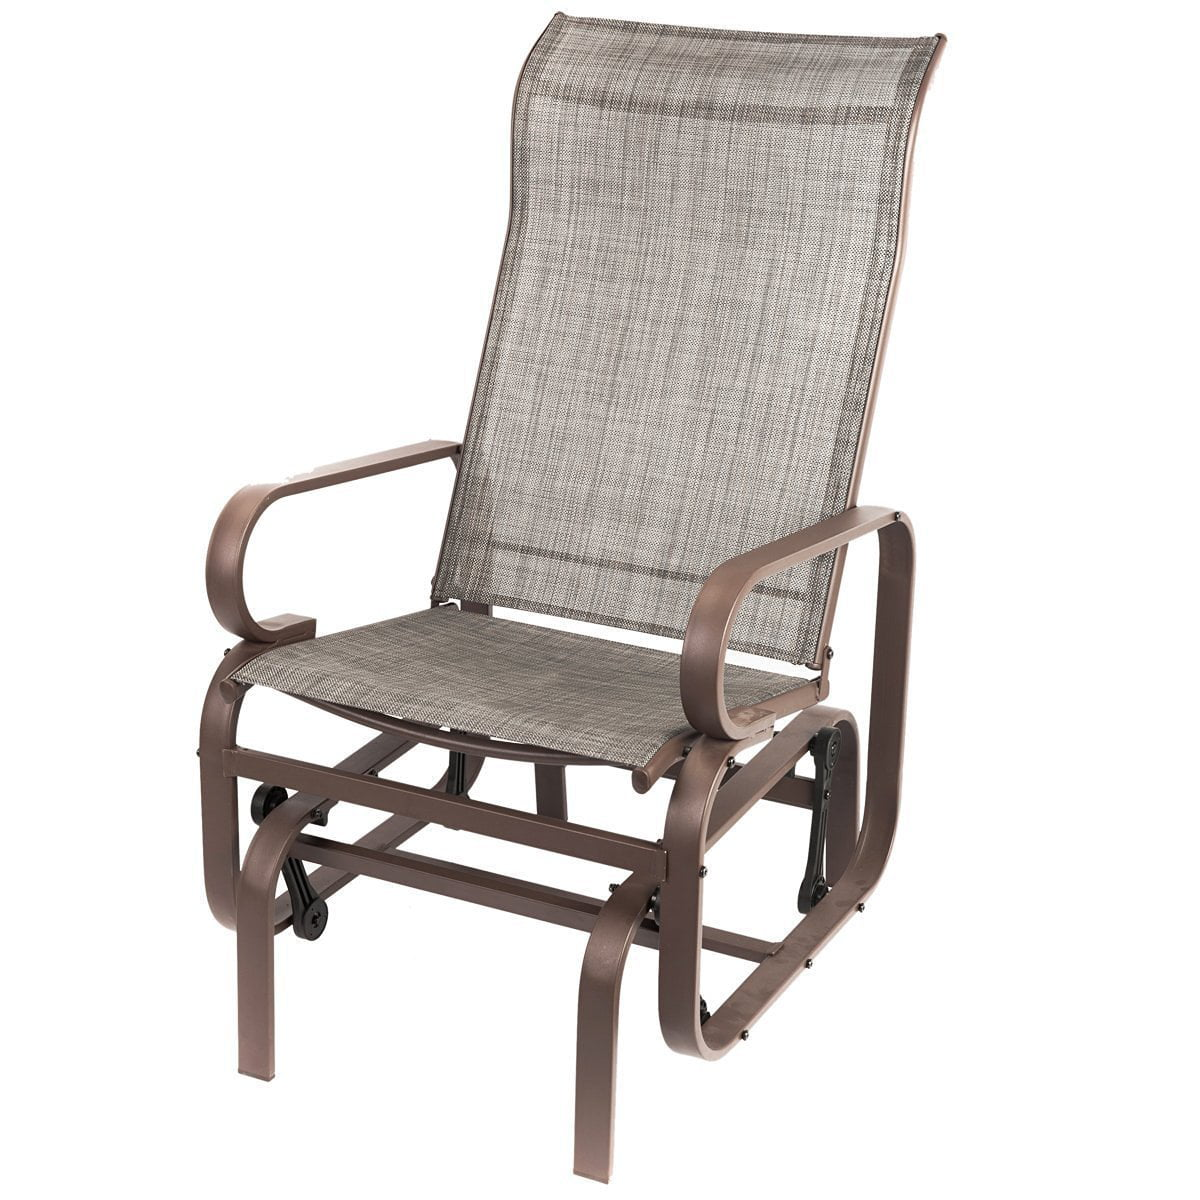 Walmart Naturefun Outdoor Patio Rocker Chair Balcony Glider Rocking Lounge  All Weatherproof Gray  Walmartcom